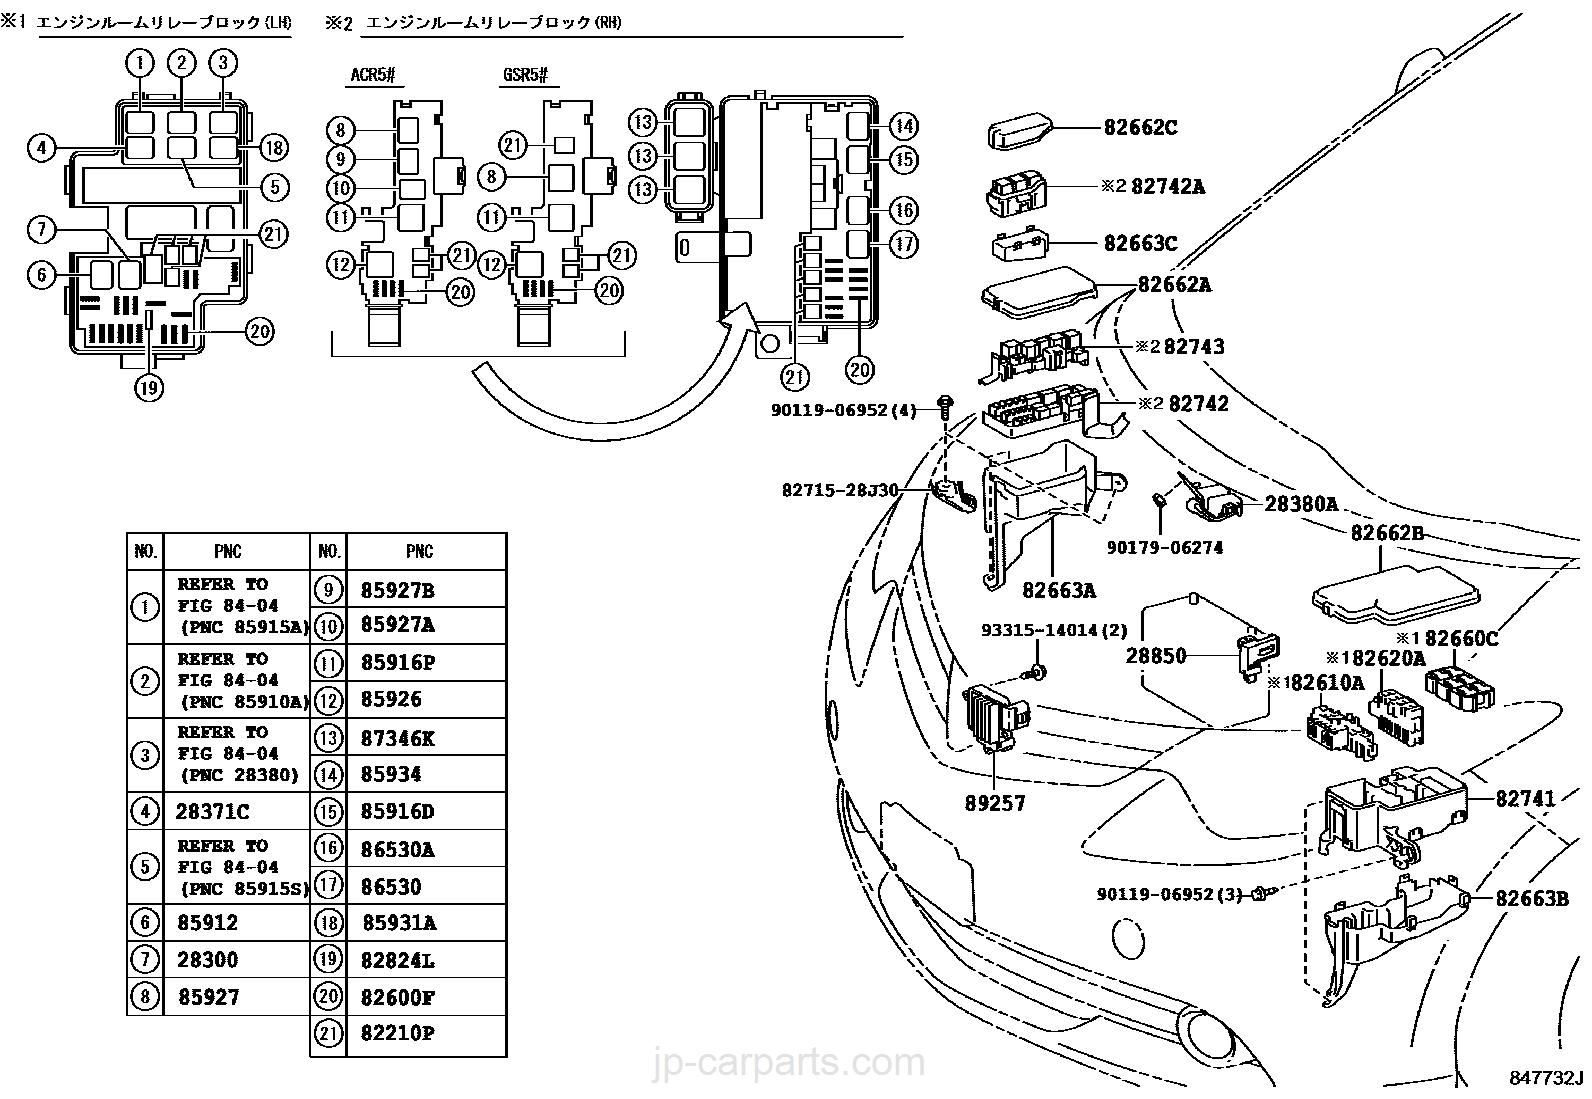 Sensational Toyota Previa Fuse Box Parts Diagram Data Schema Wiring Digital Resources Hetepmognl